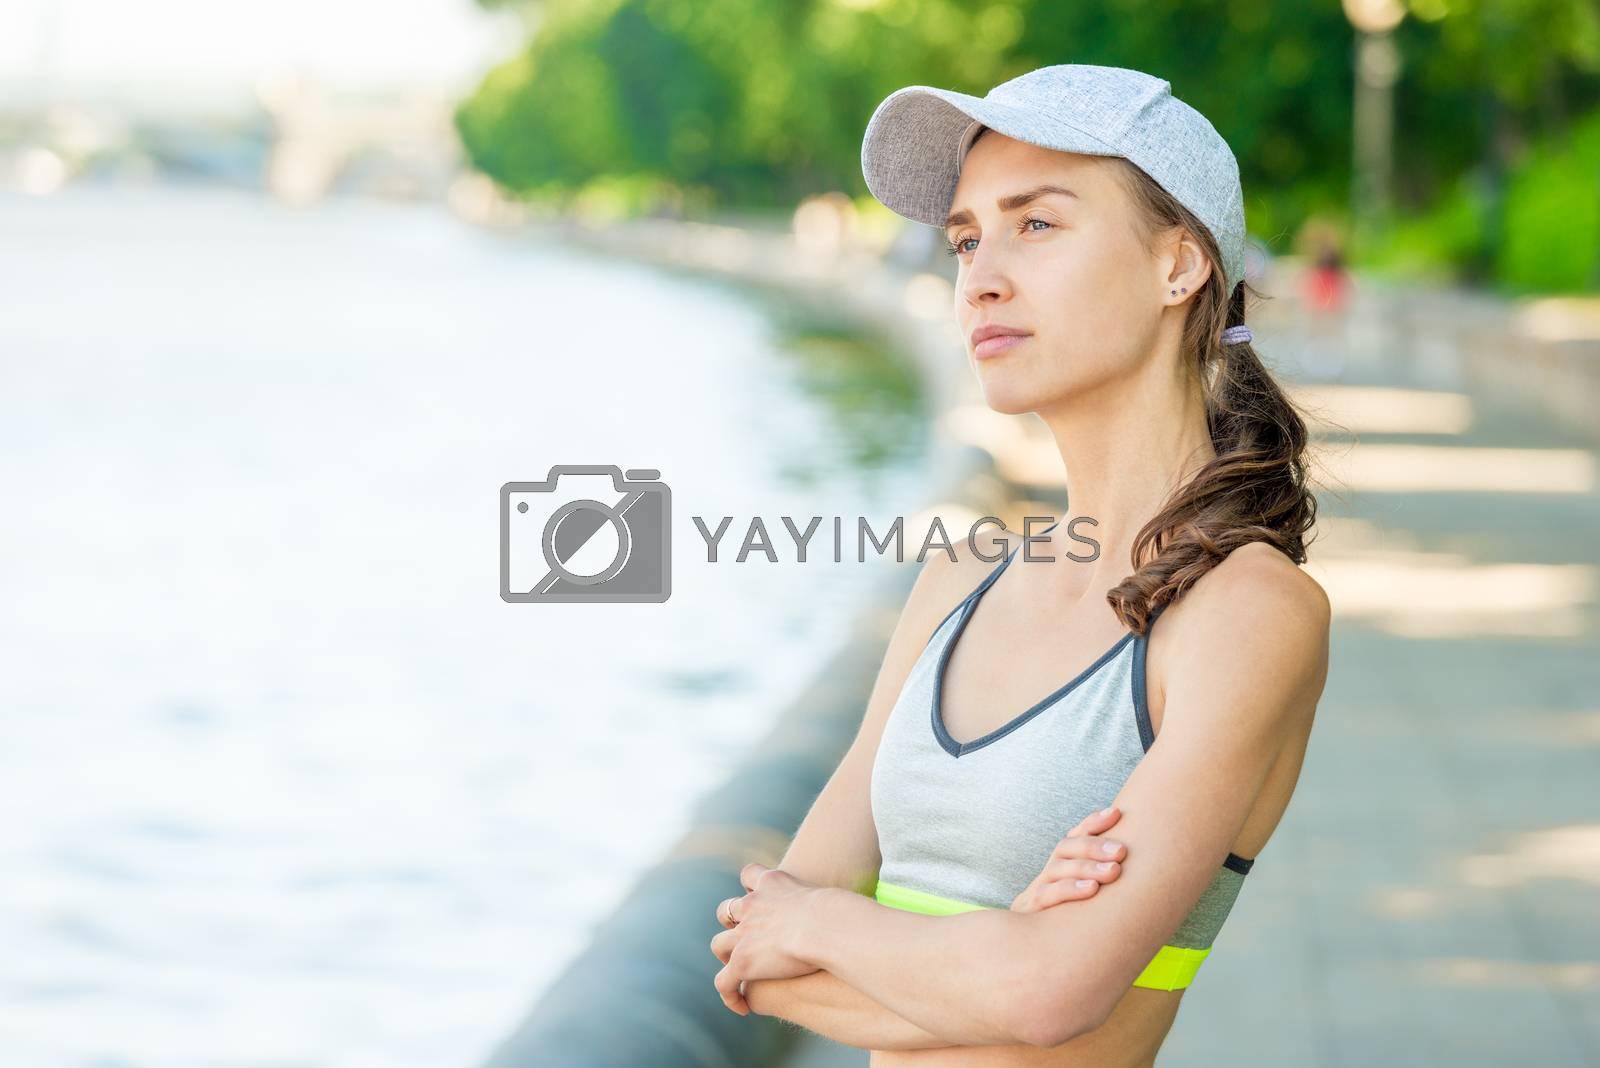 Vertical close-up portrait of a dreamy sportswoman who is posing by Labunskiy K.